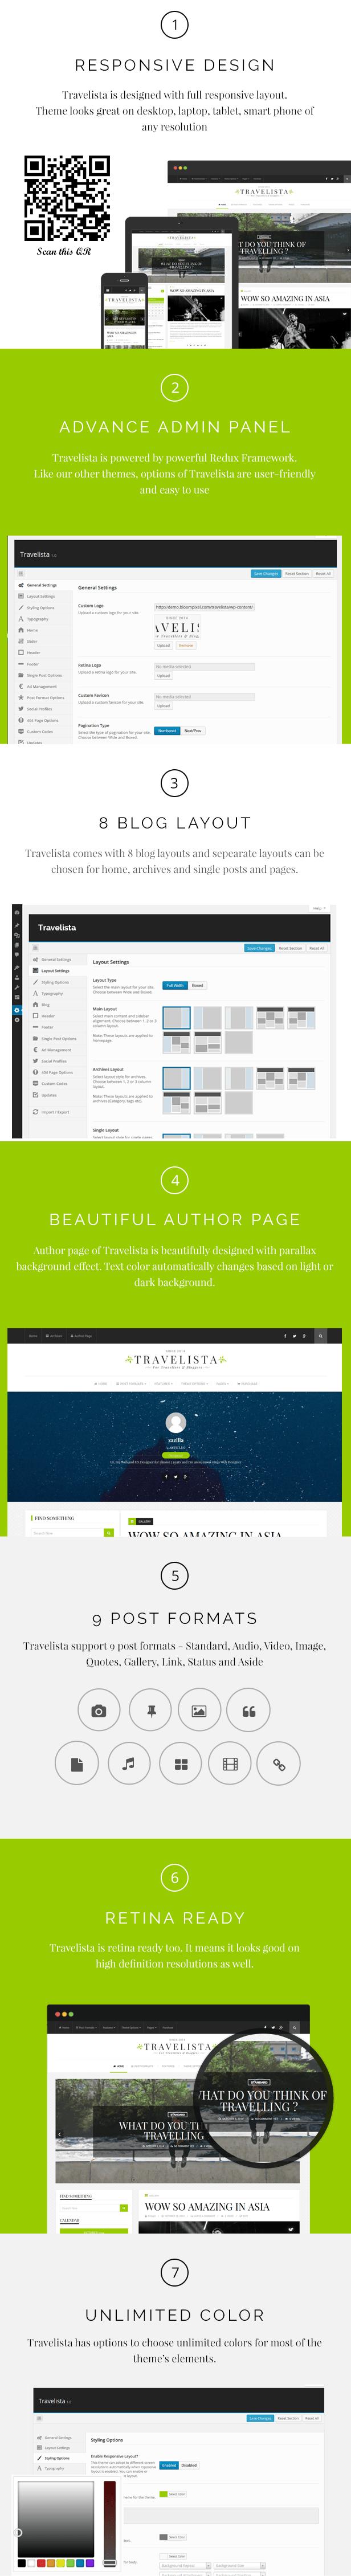 Travelista - WordPress Blog Theme - 4